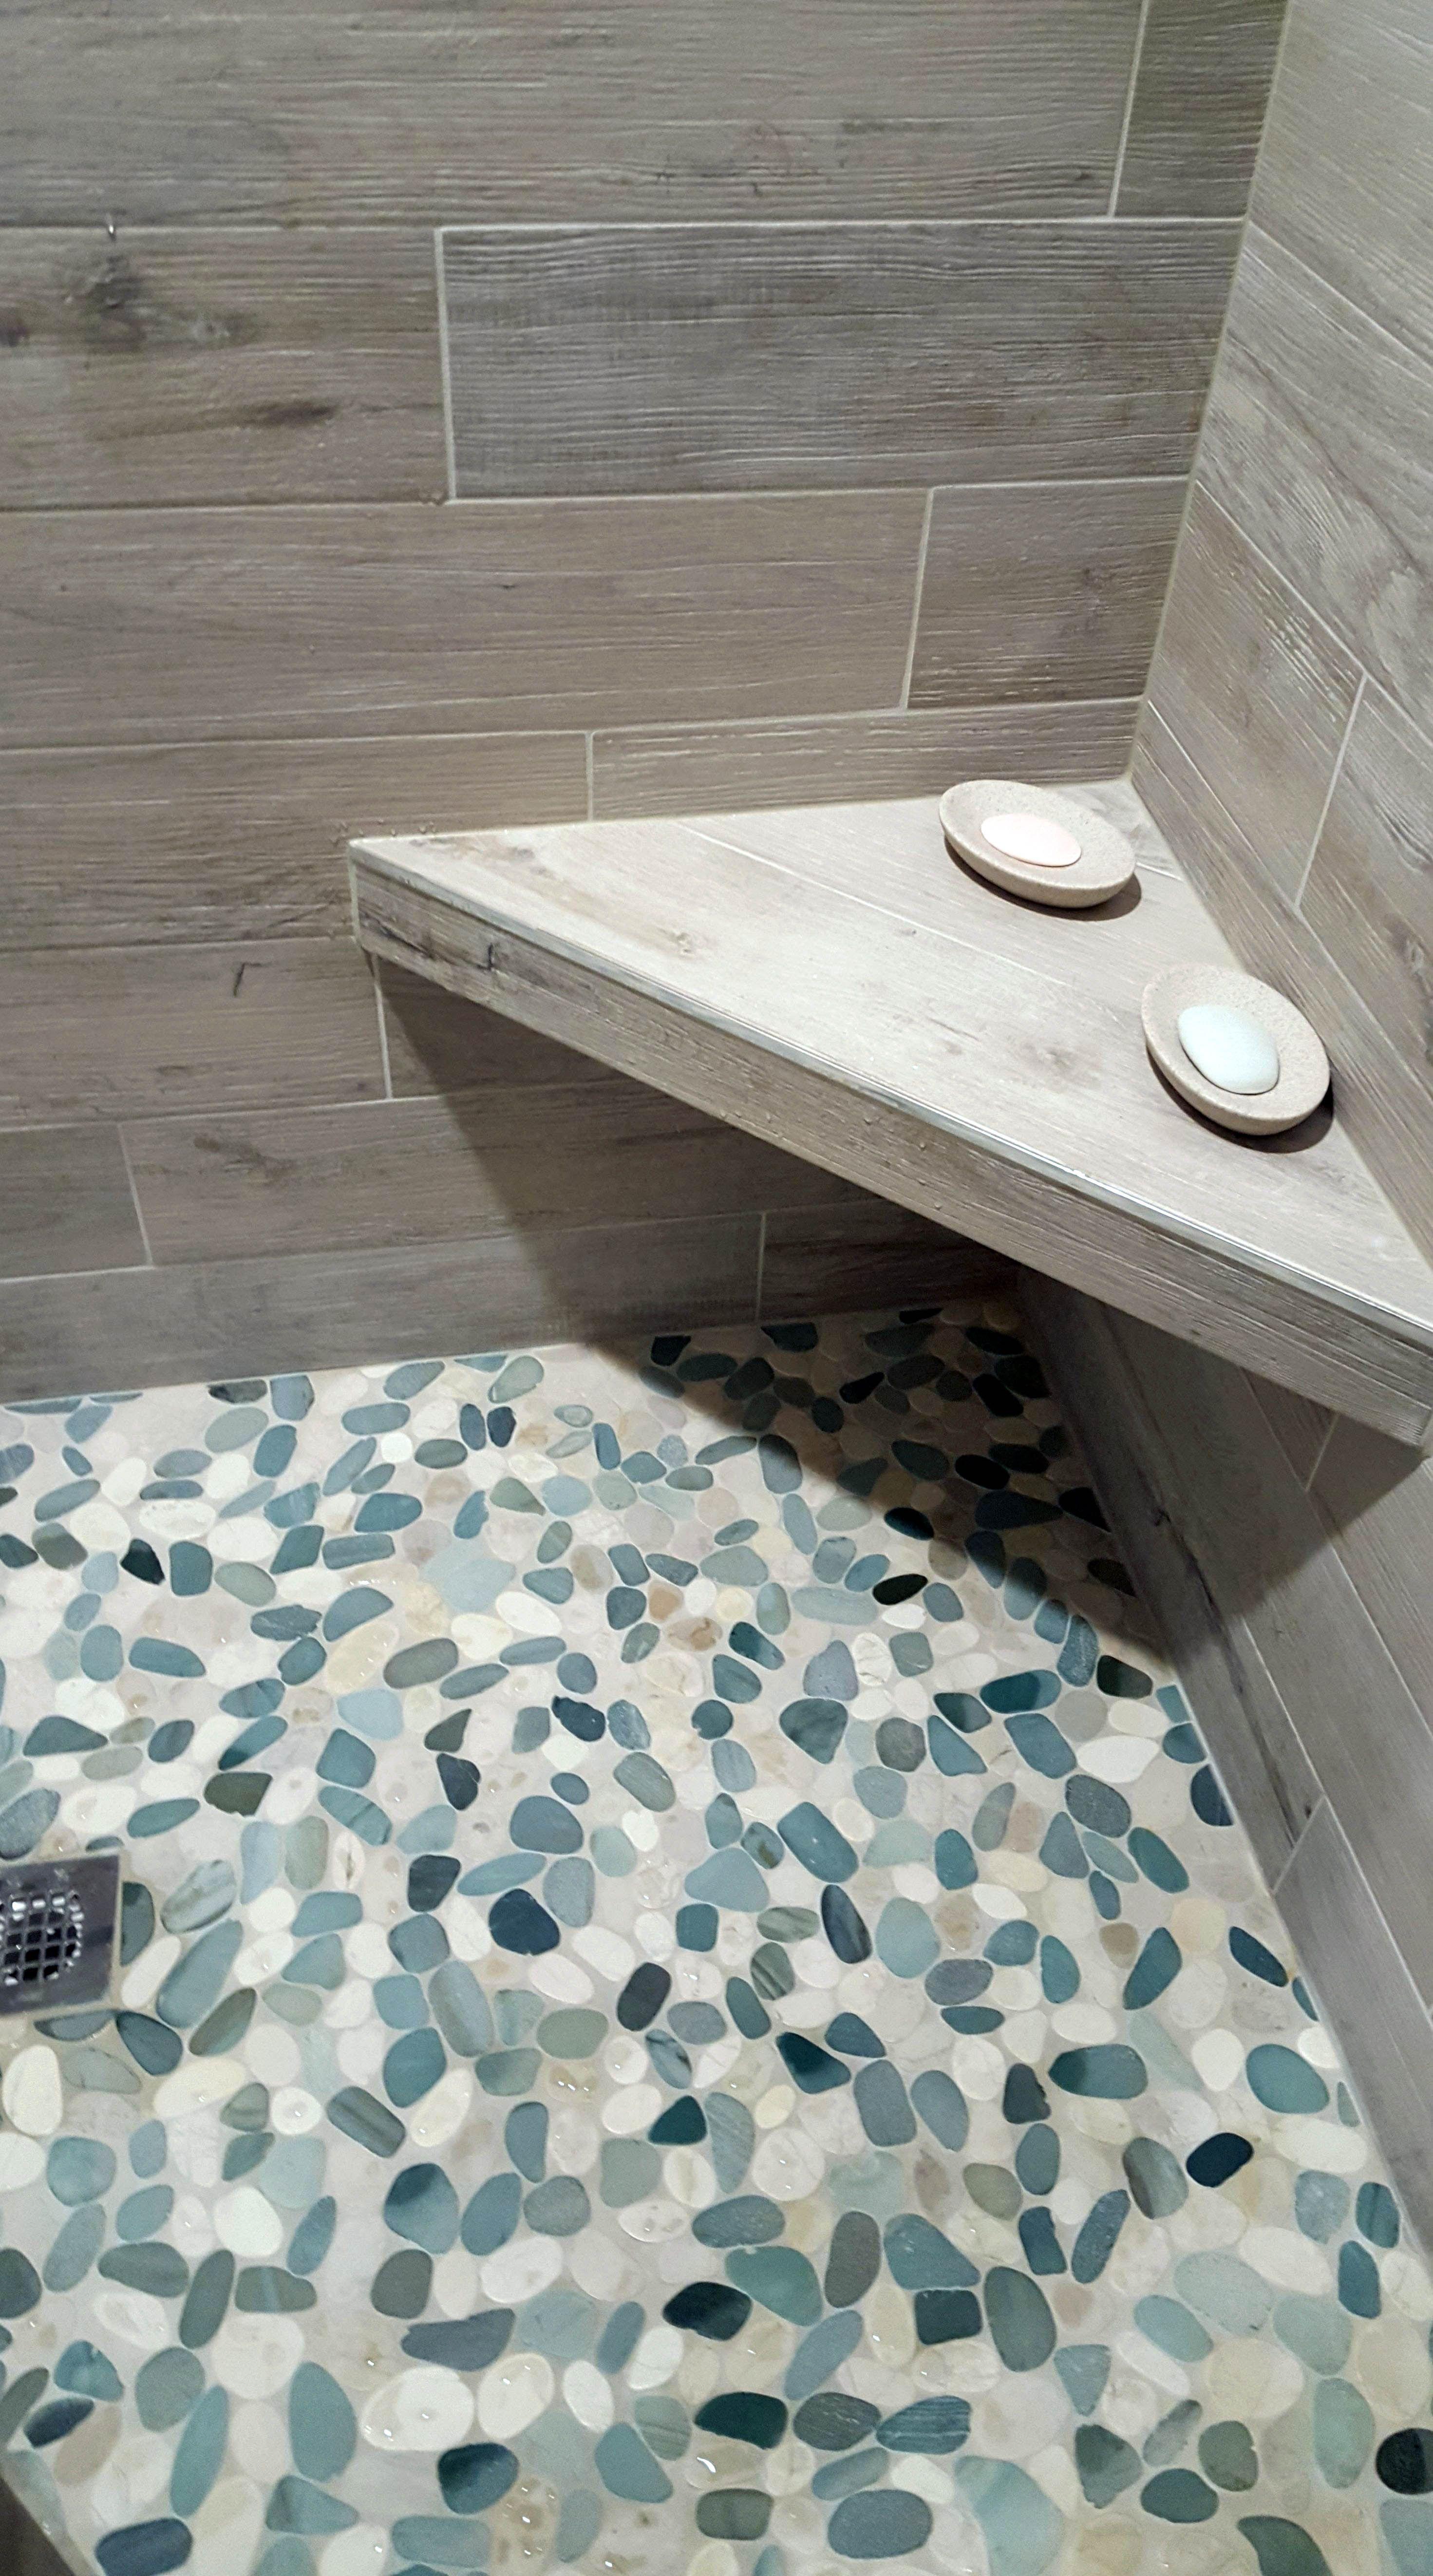 15 Of Our Favorite Shower Tile Ideas Shower Floor Tile Shower